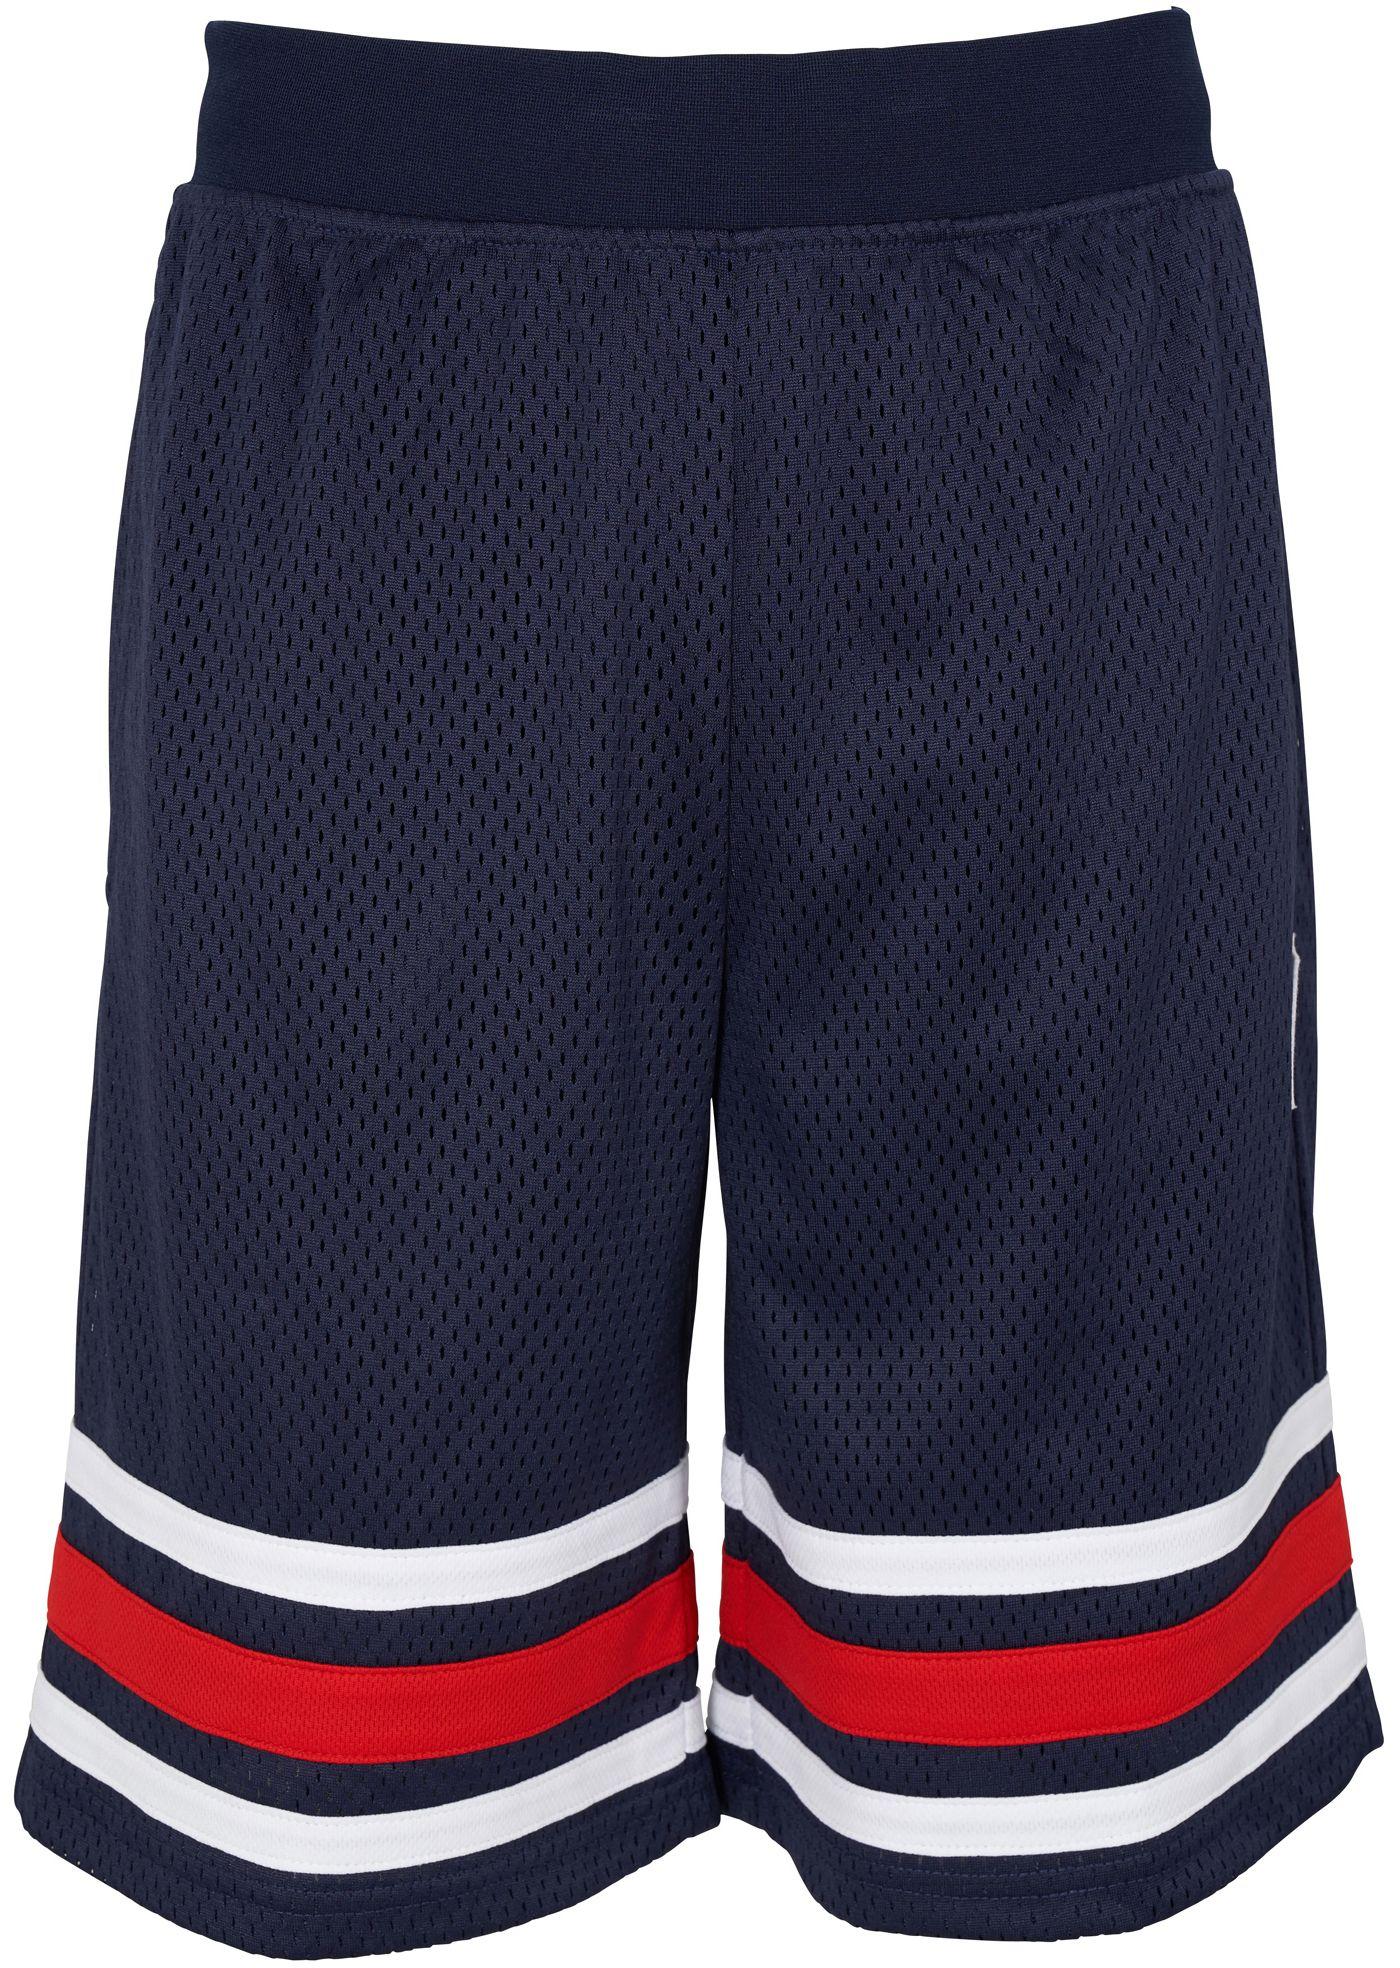 FILA Boy's Mesh Shorts